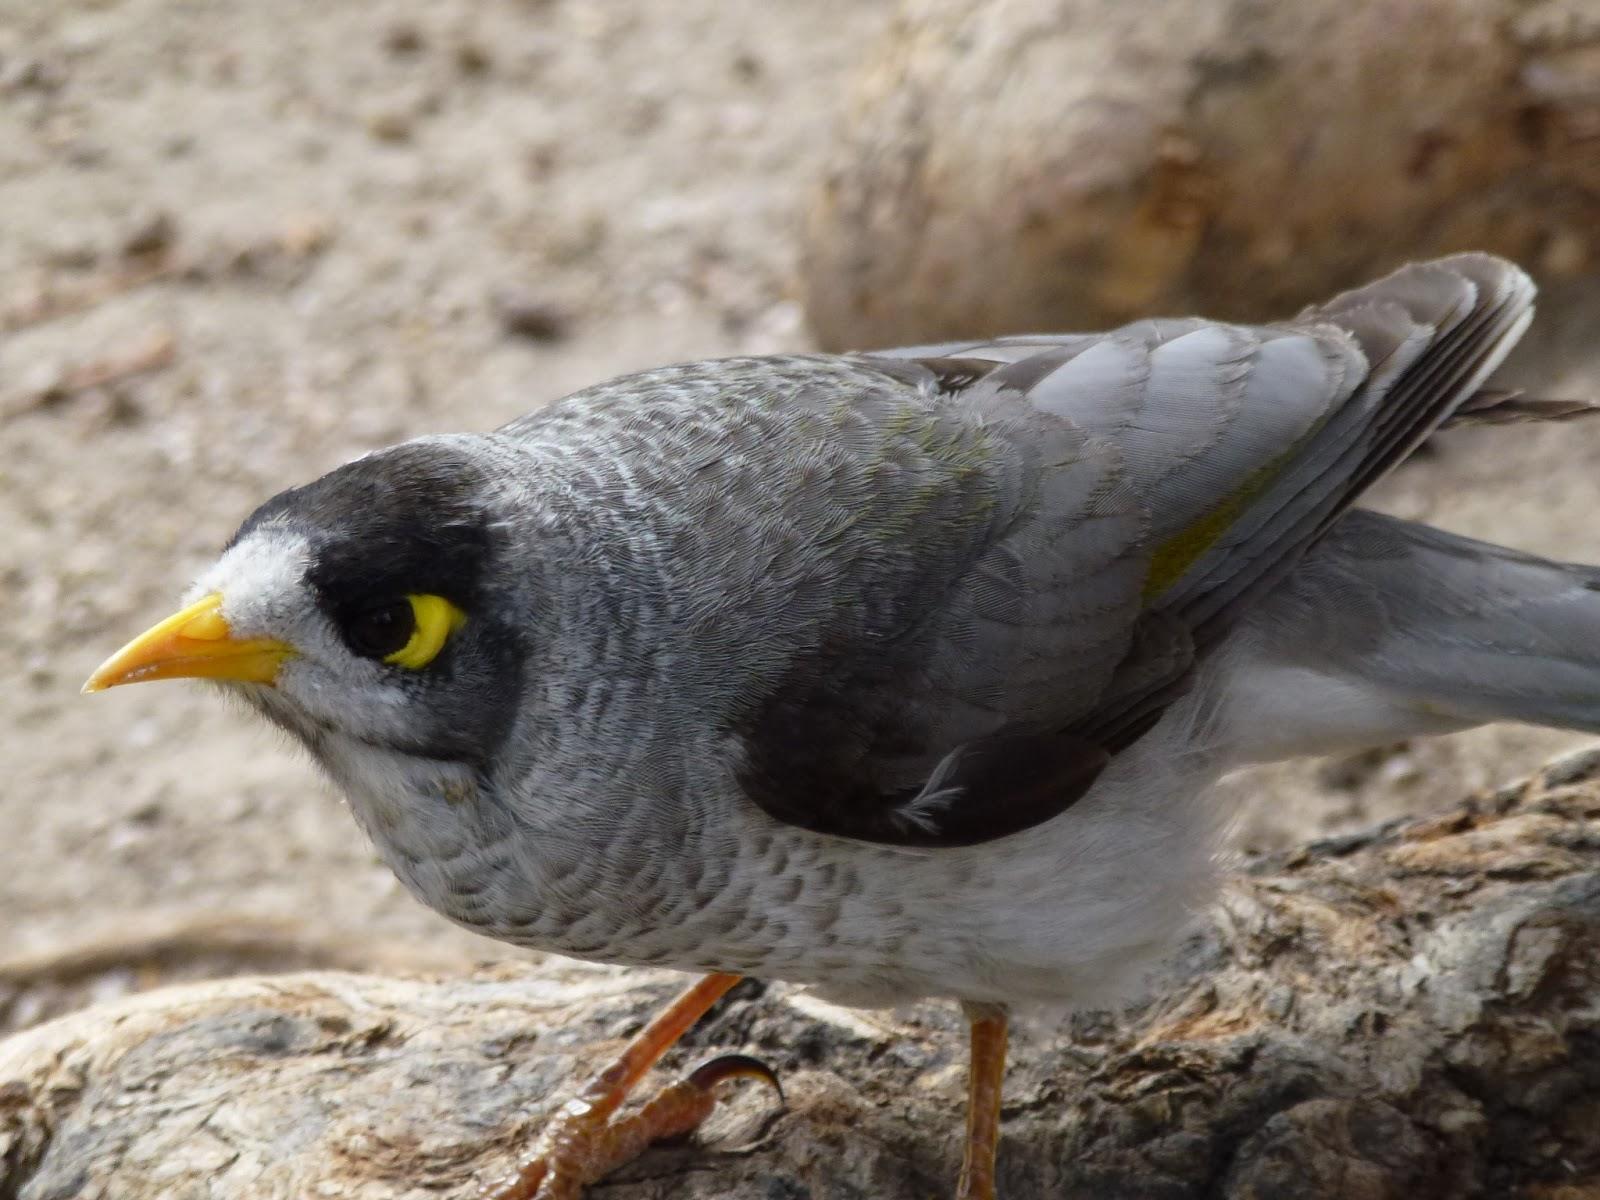 Australian miner bird photos Cached